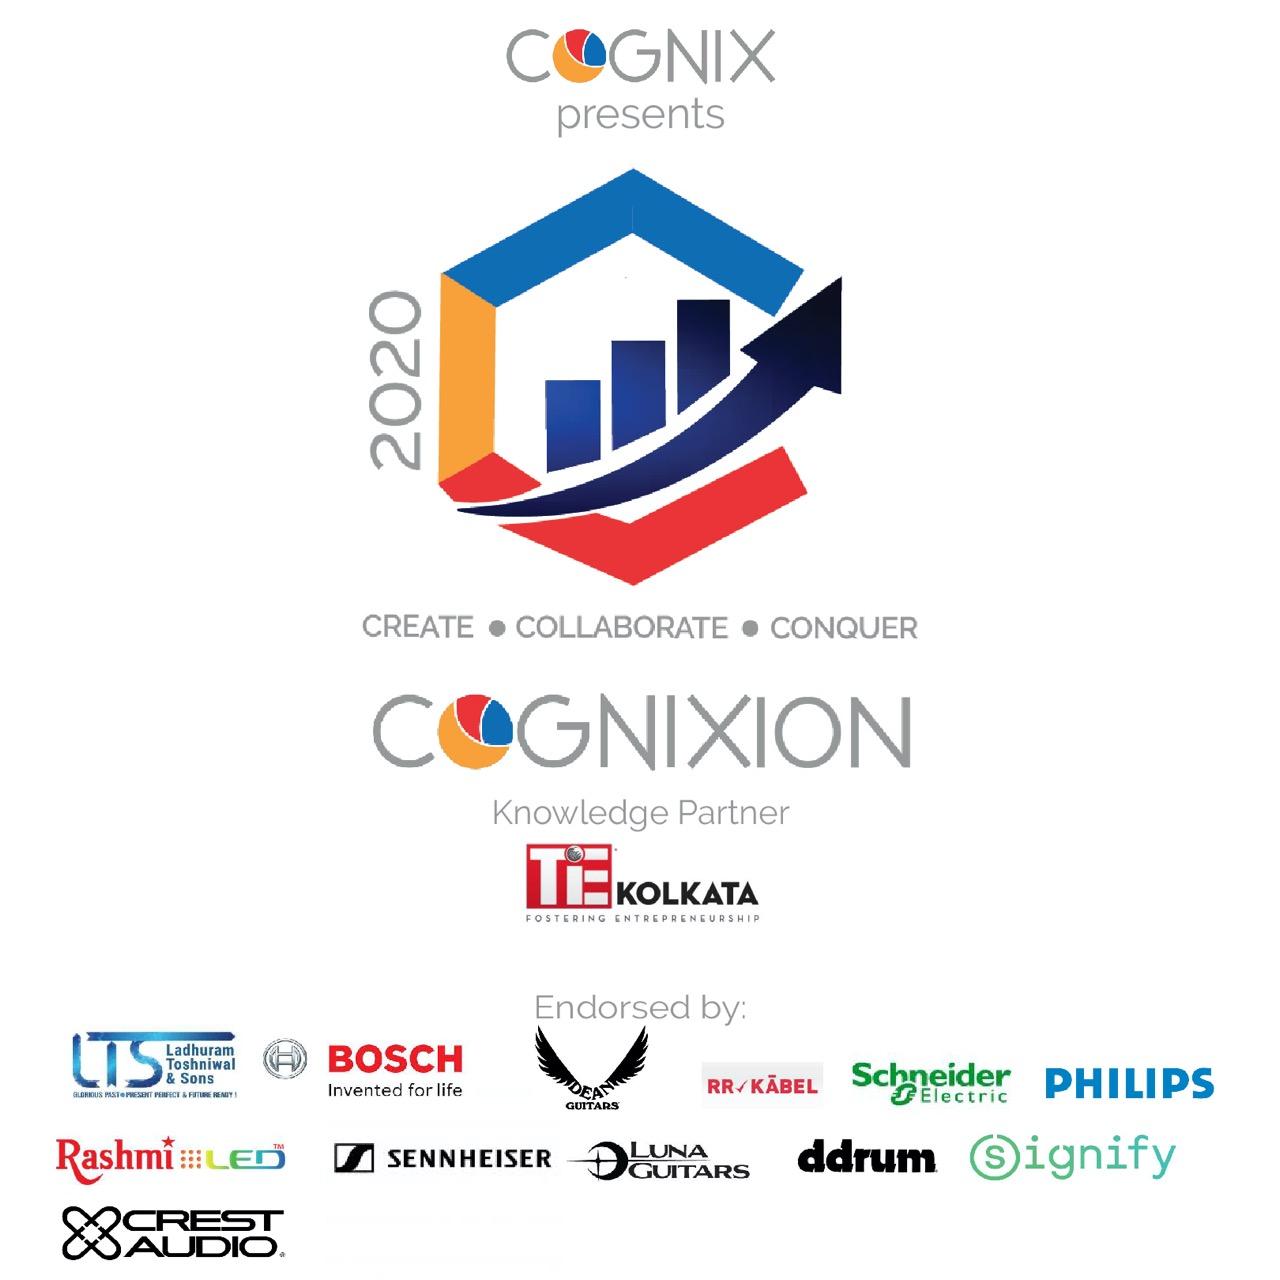 Cognixion 2020 Logo + Partners